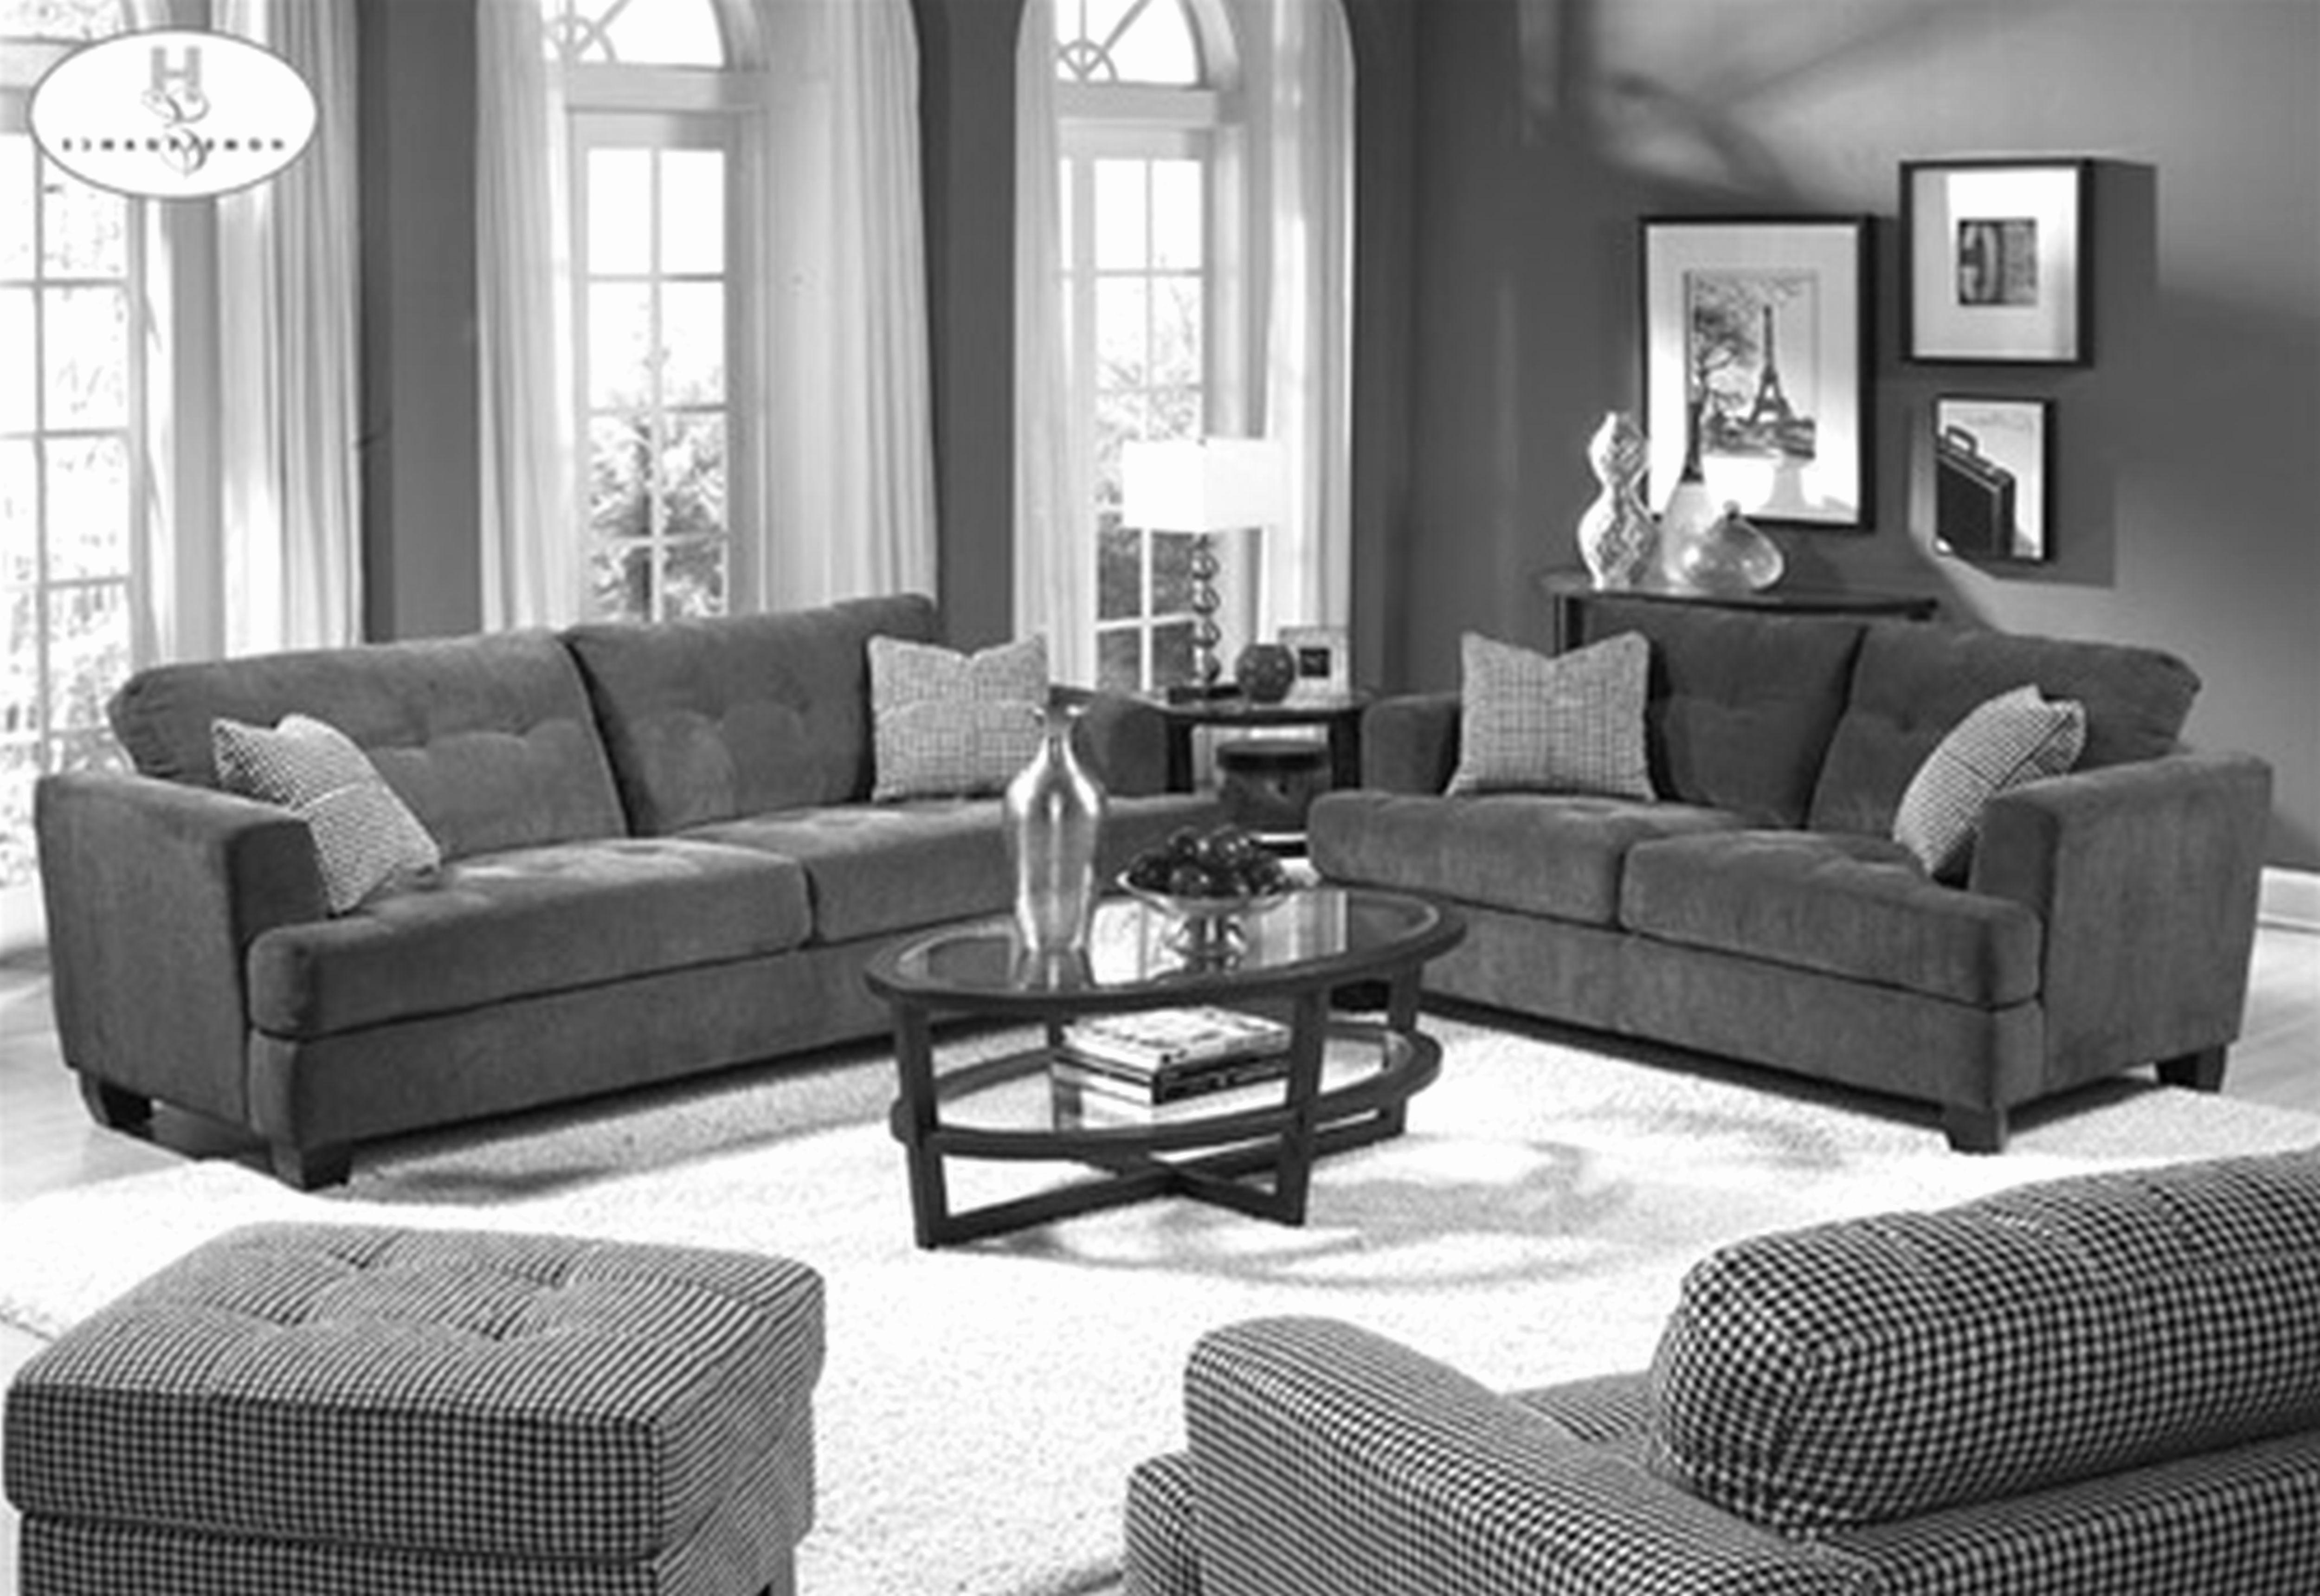 Luxury Velvet Sofa Set Pics Velvet Sofa Set Luxury Plush Grey Themes Living Room Design With Gr White Living Room Decor Grey Couch Living Room Living Room Grey